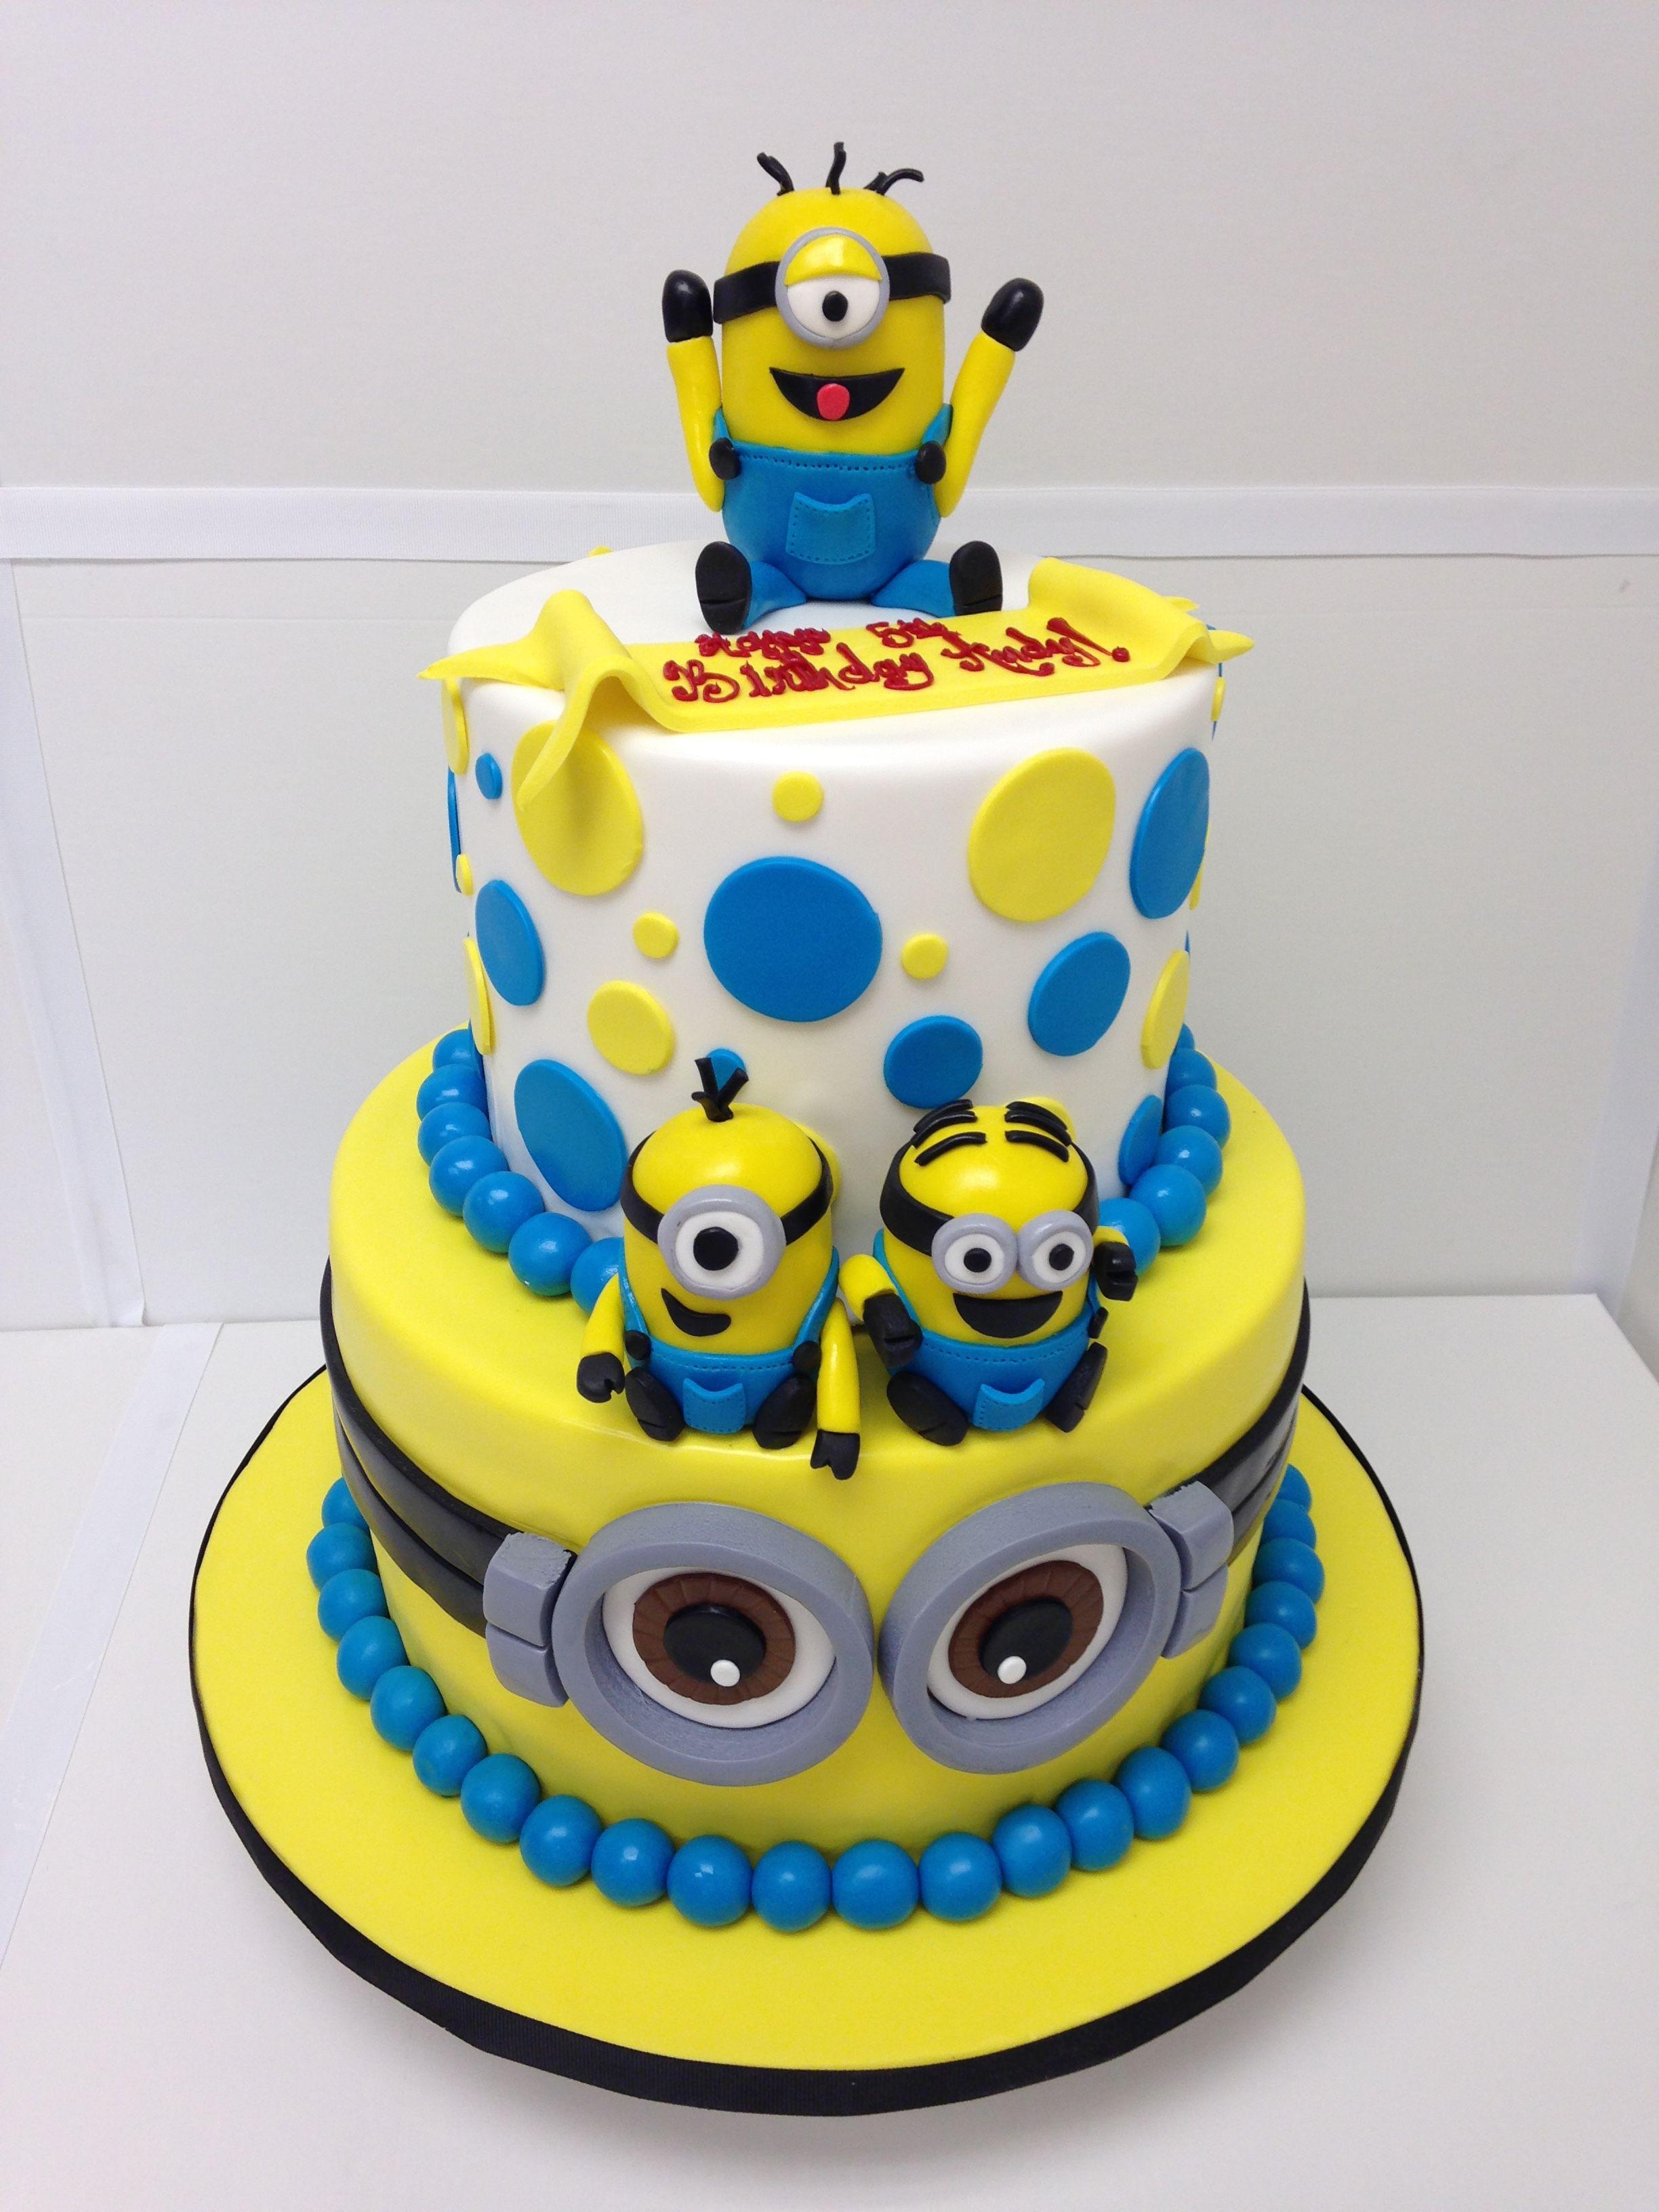 25 Elegant Image Of Minions Birthday Cakes Davemelillo Com